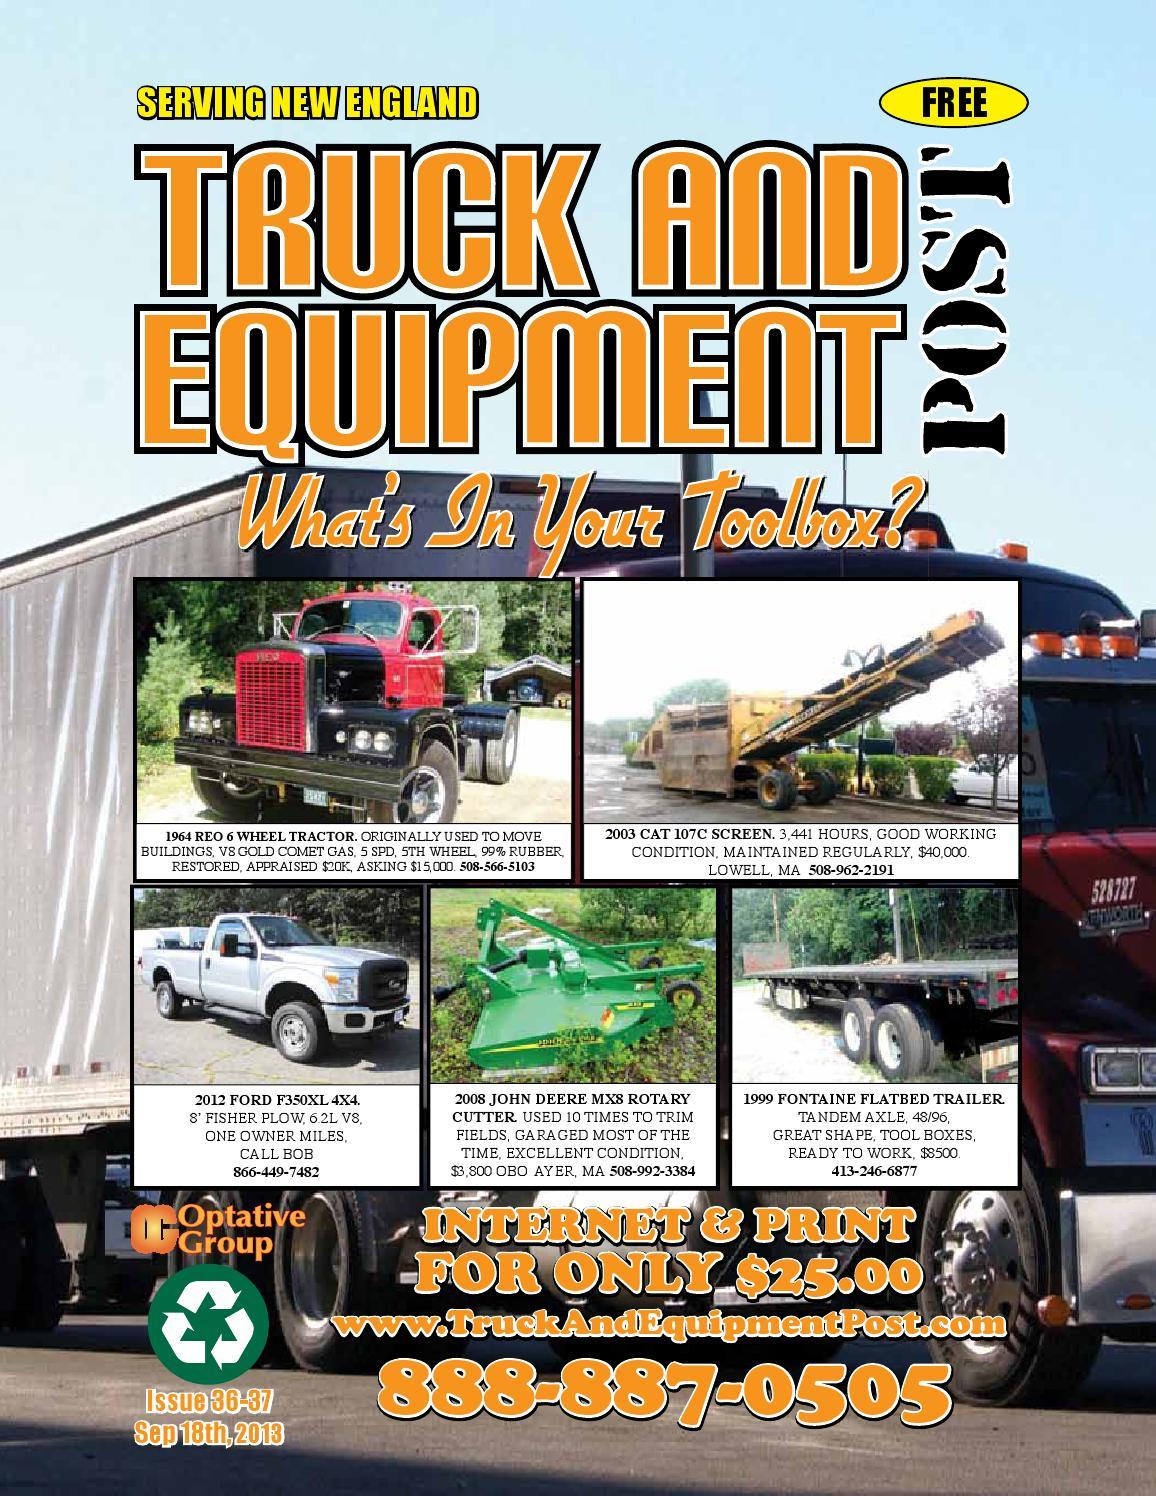 Truck equipment post 36 37 2013 by 1ClickAway - issuu